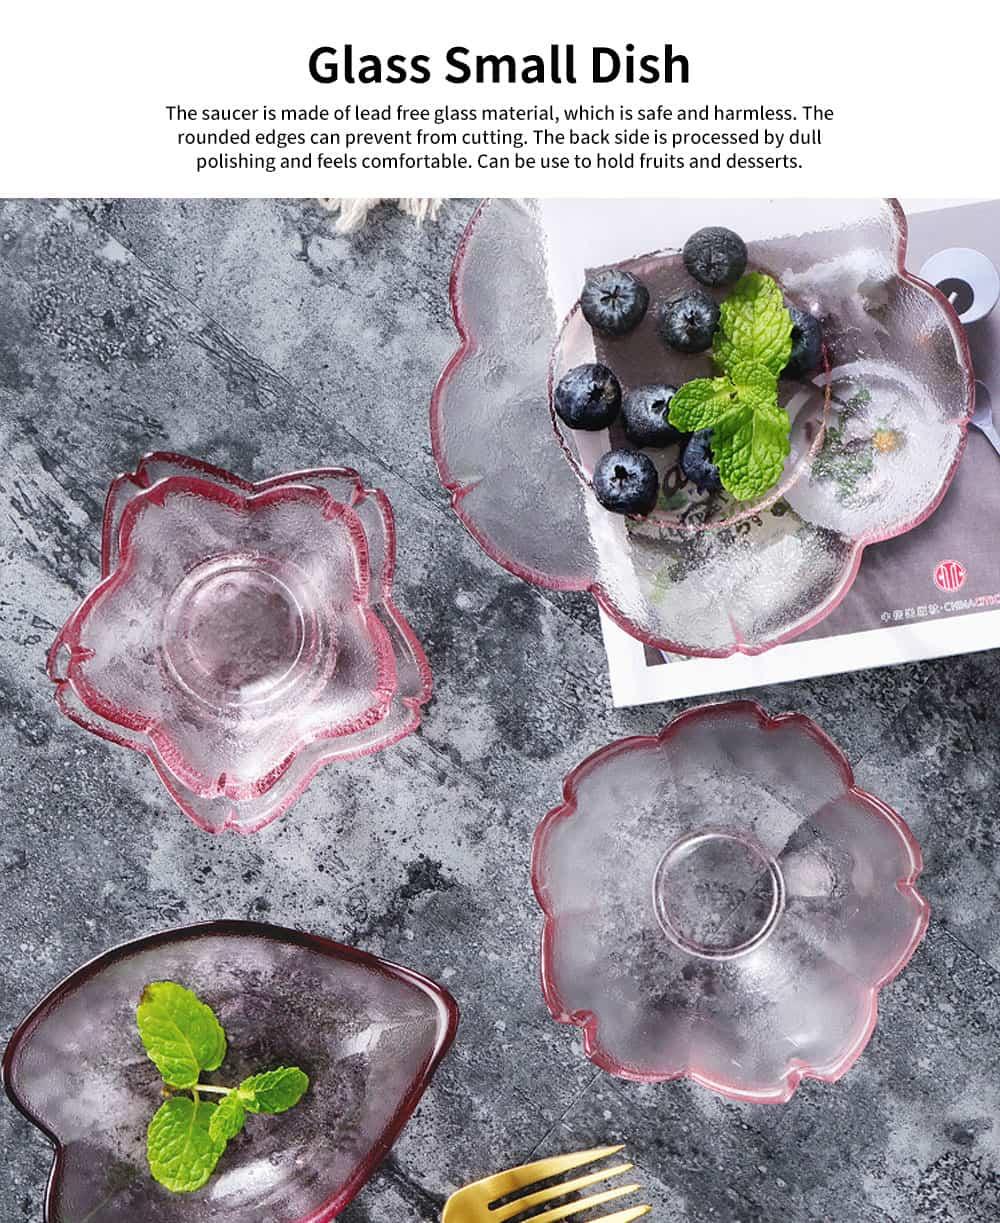 Japanese Cherry Little Dish Crystal Glass Small Bowl Fruit Dessert Plate Pink Dull Polish Saucer for Household 0